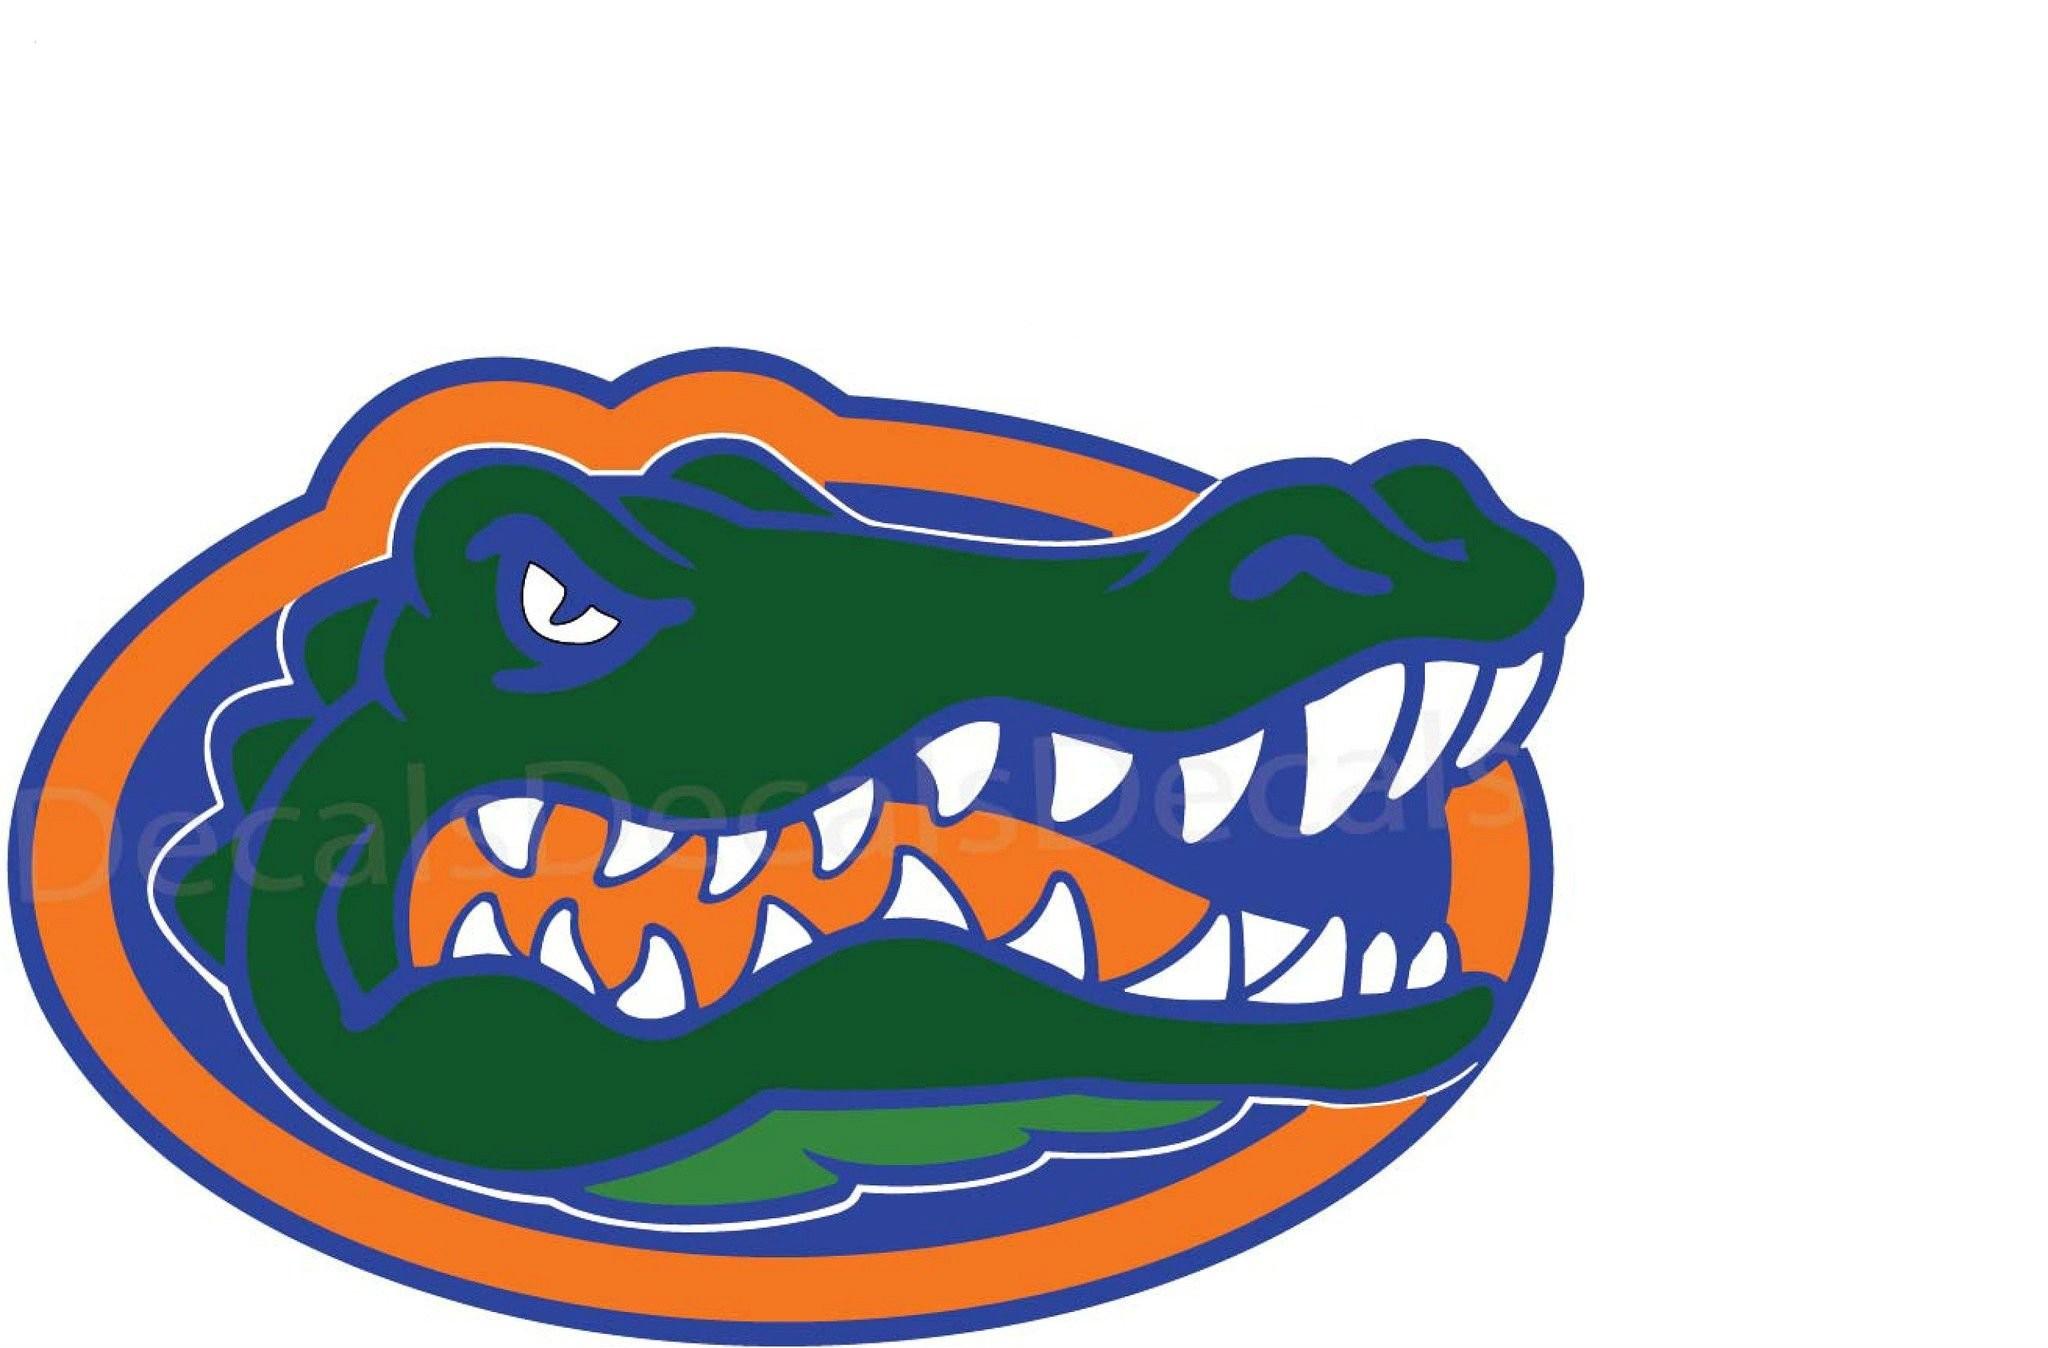 Florida Gators Wallpapers 70 Images